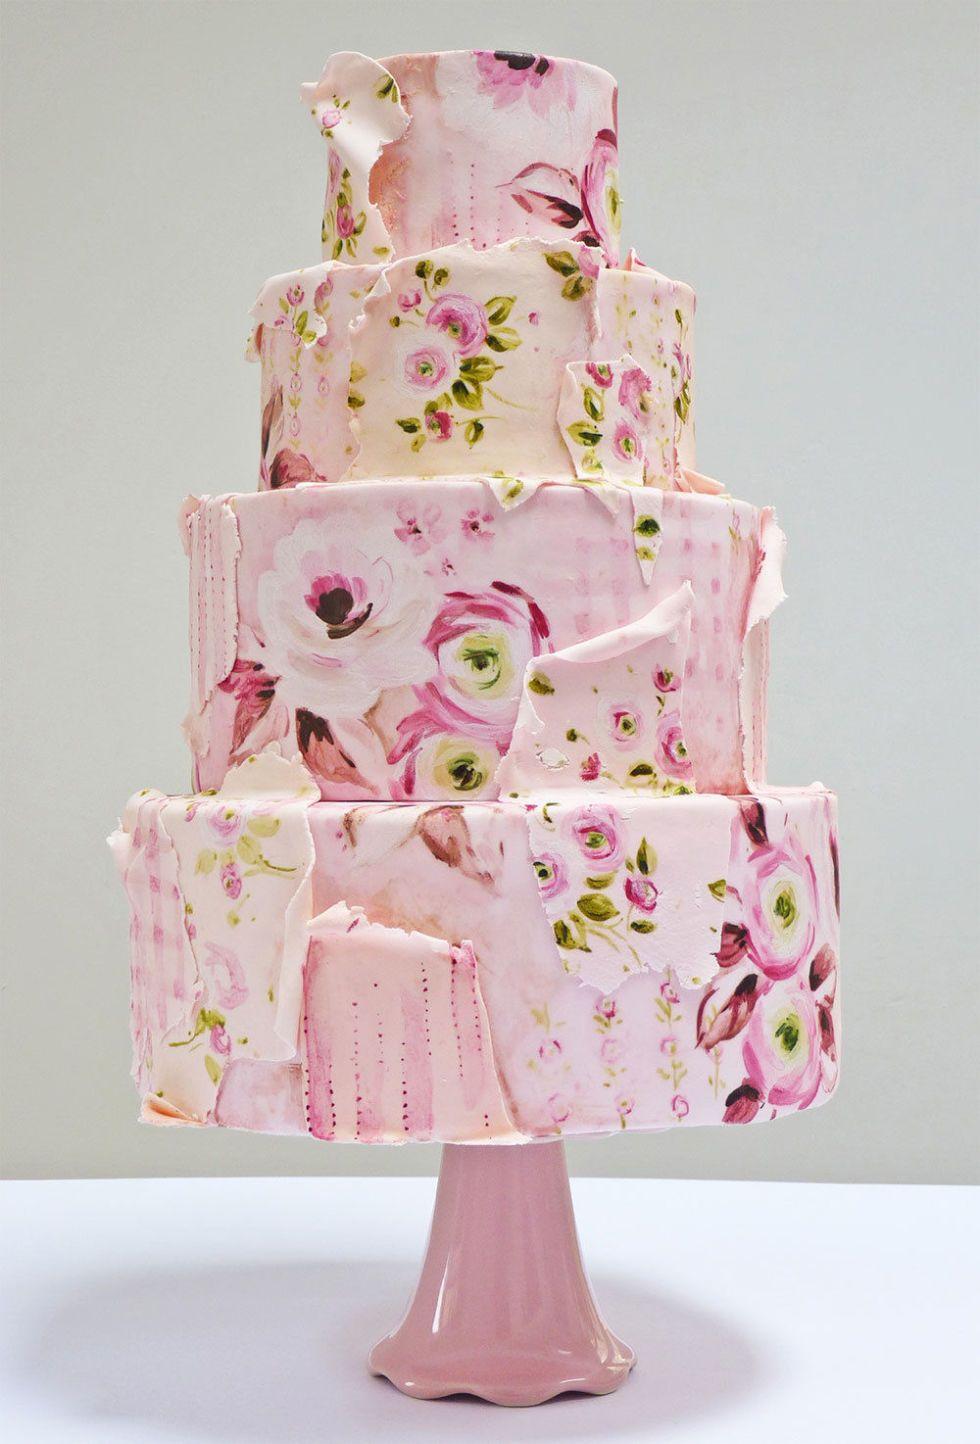 Best Wedding Cakes | Cake | Pinterest | Pie cake, Pies and Cake